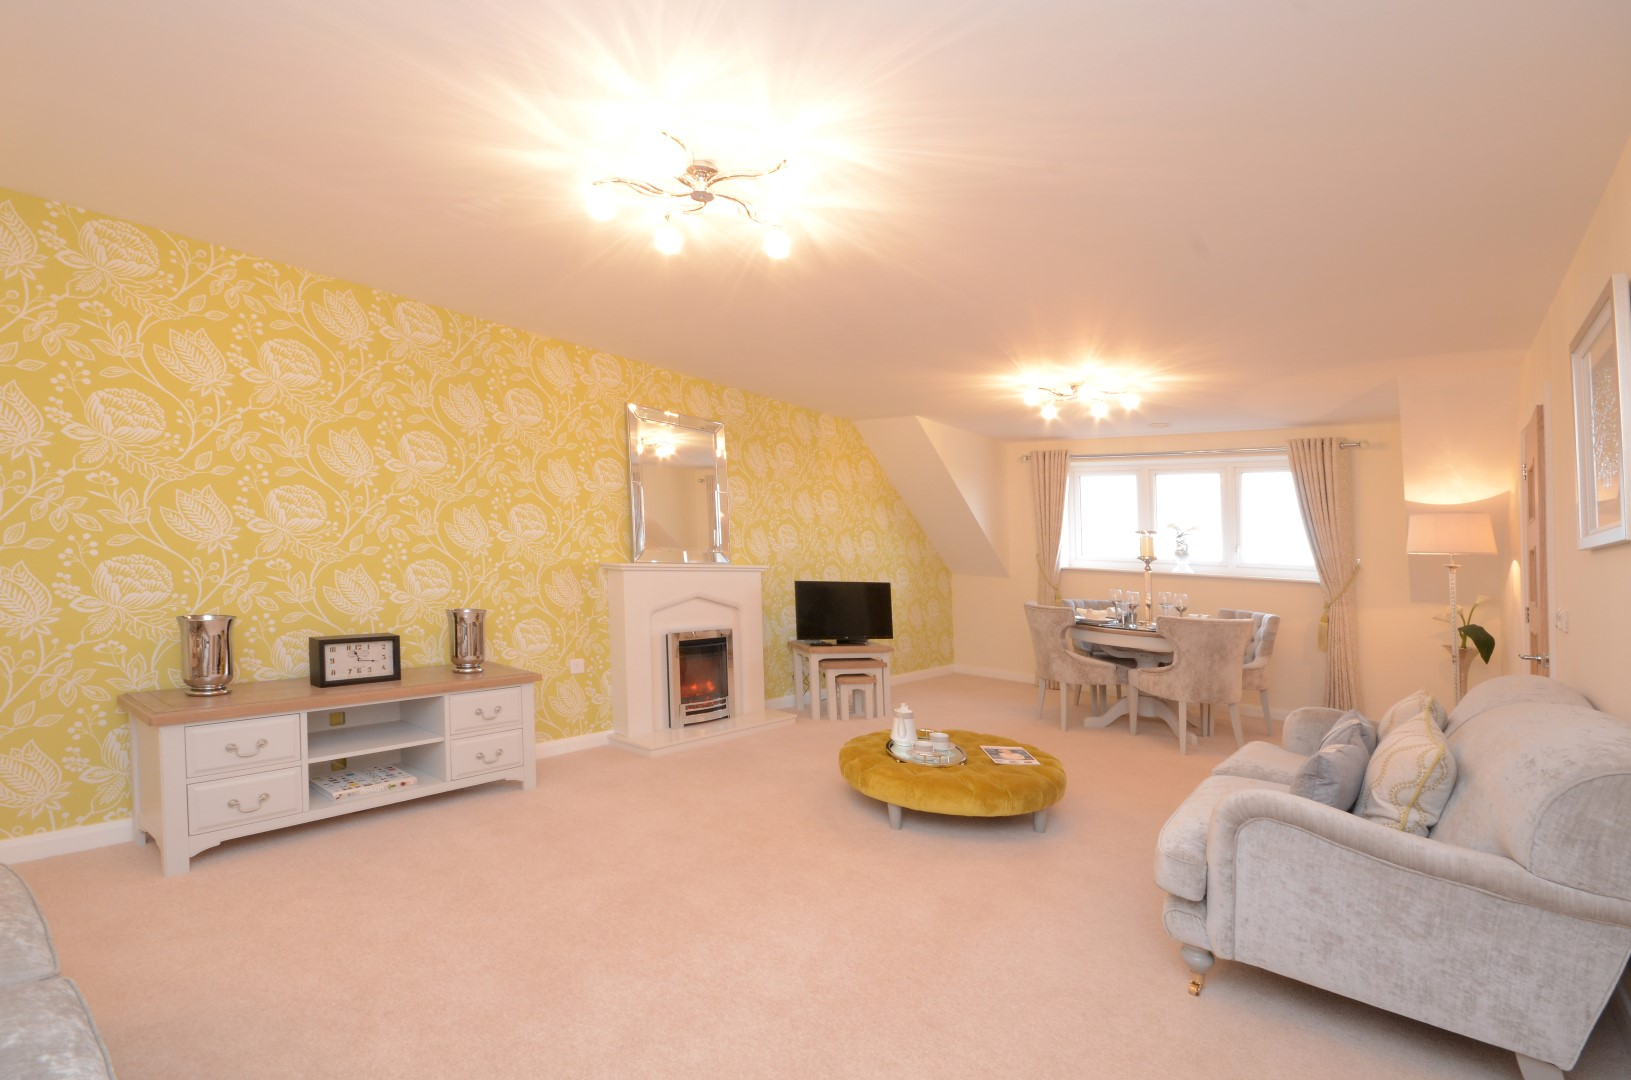 interior-photography-yorkshire-livingroom (2)